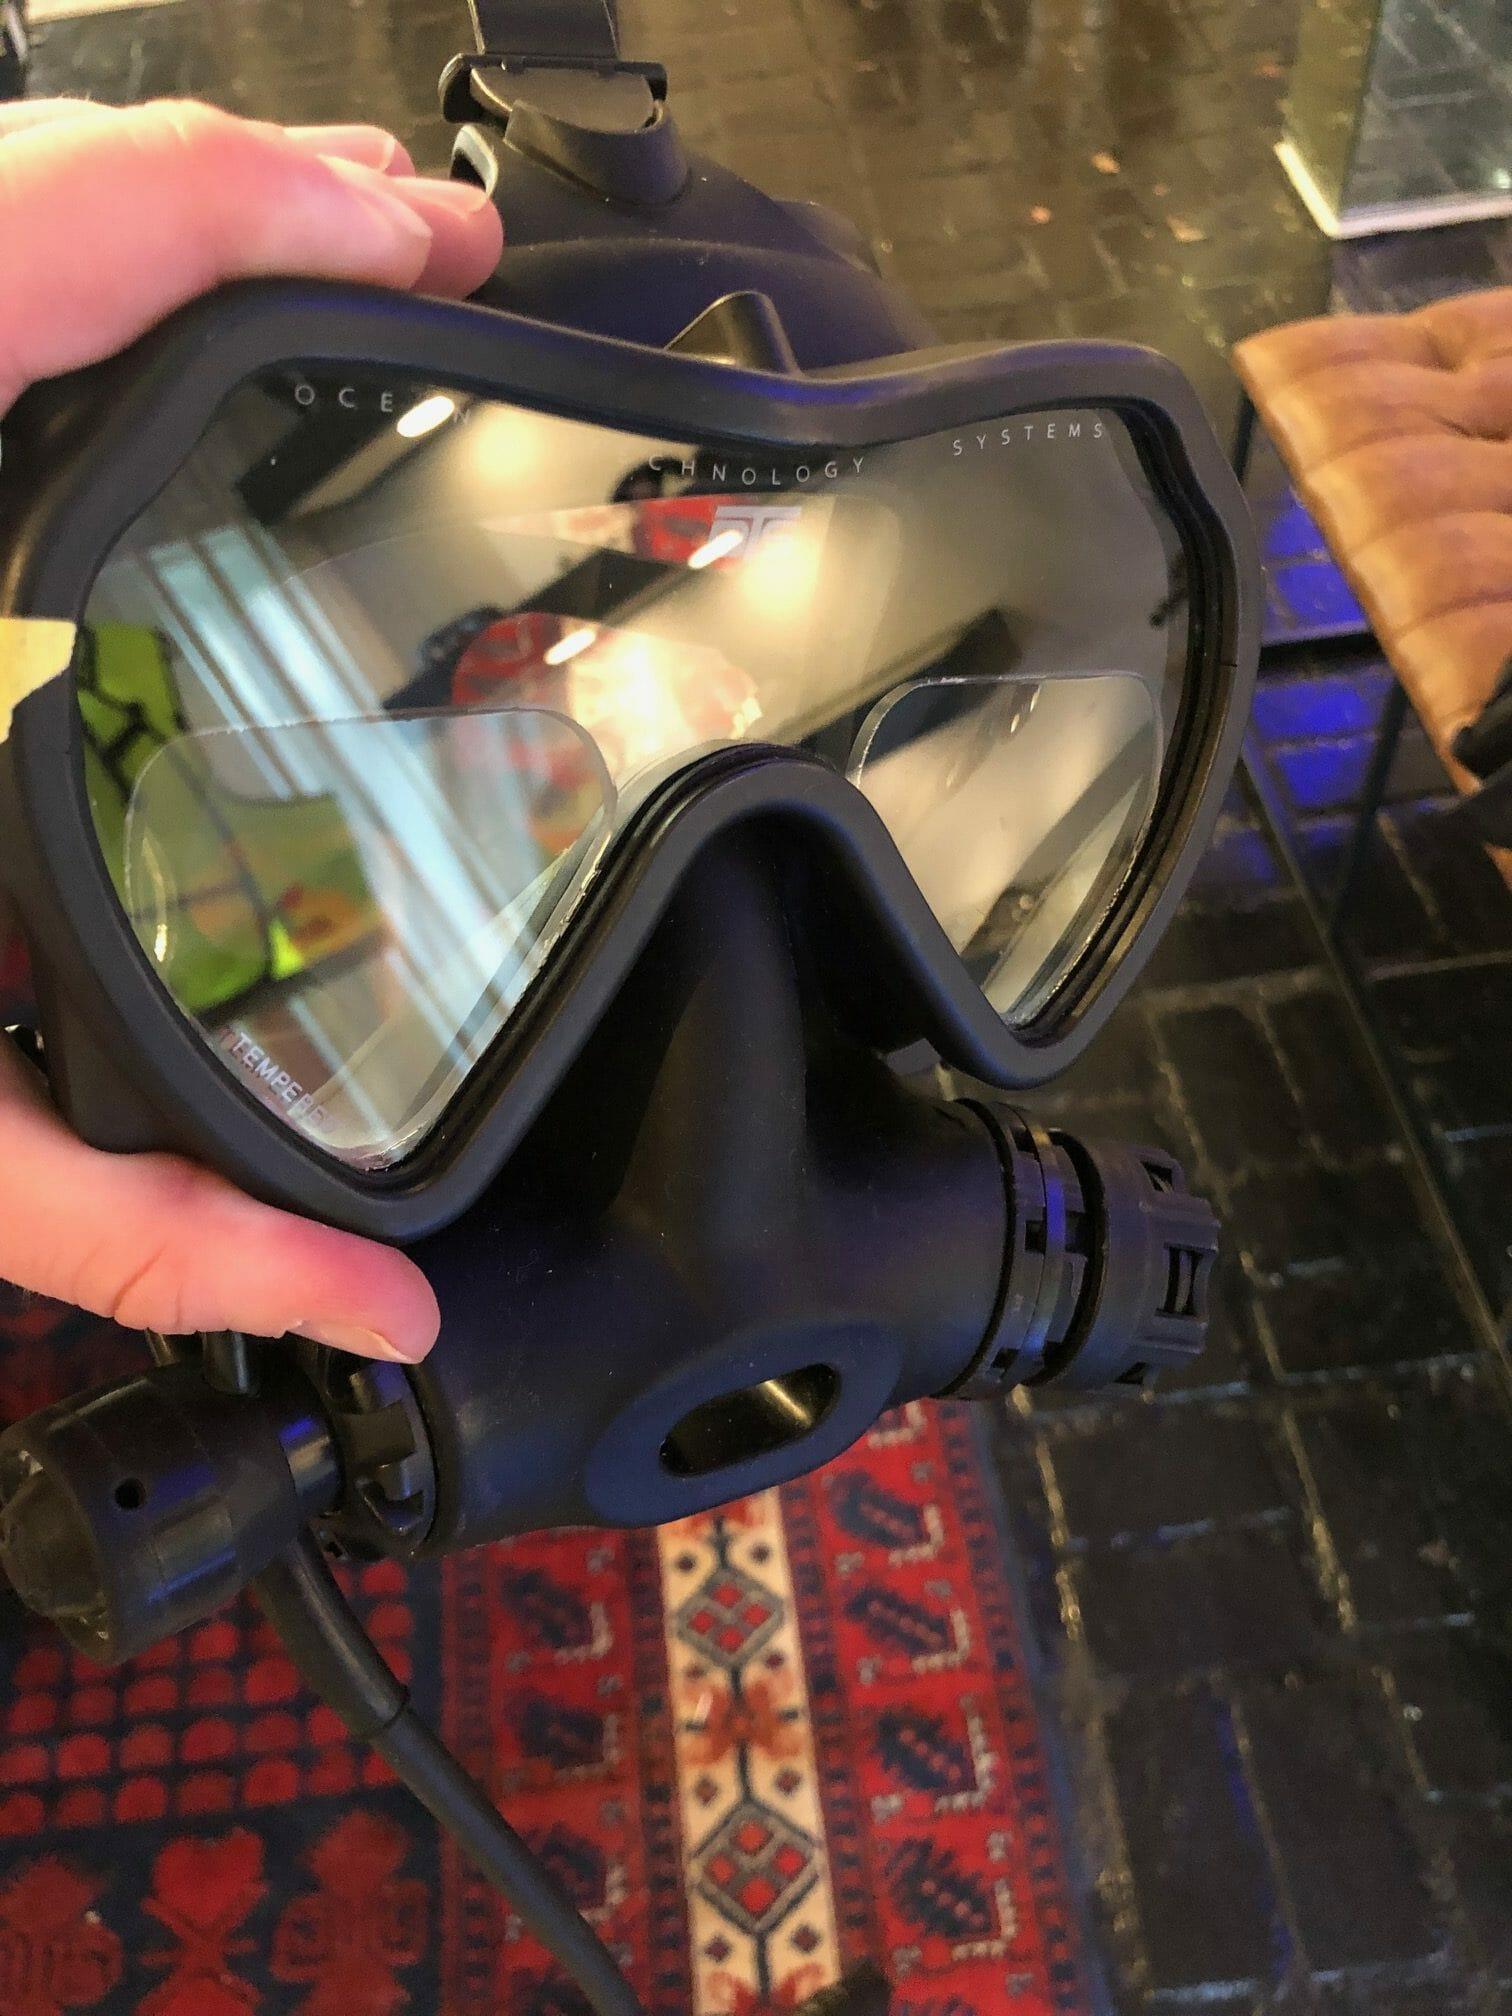 OTS Spectrum full face diving mask with reading lenses installed